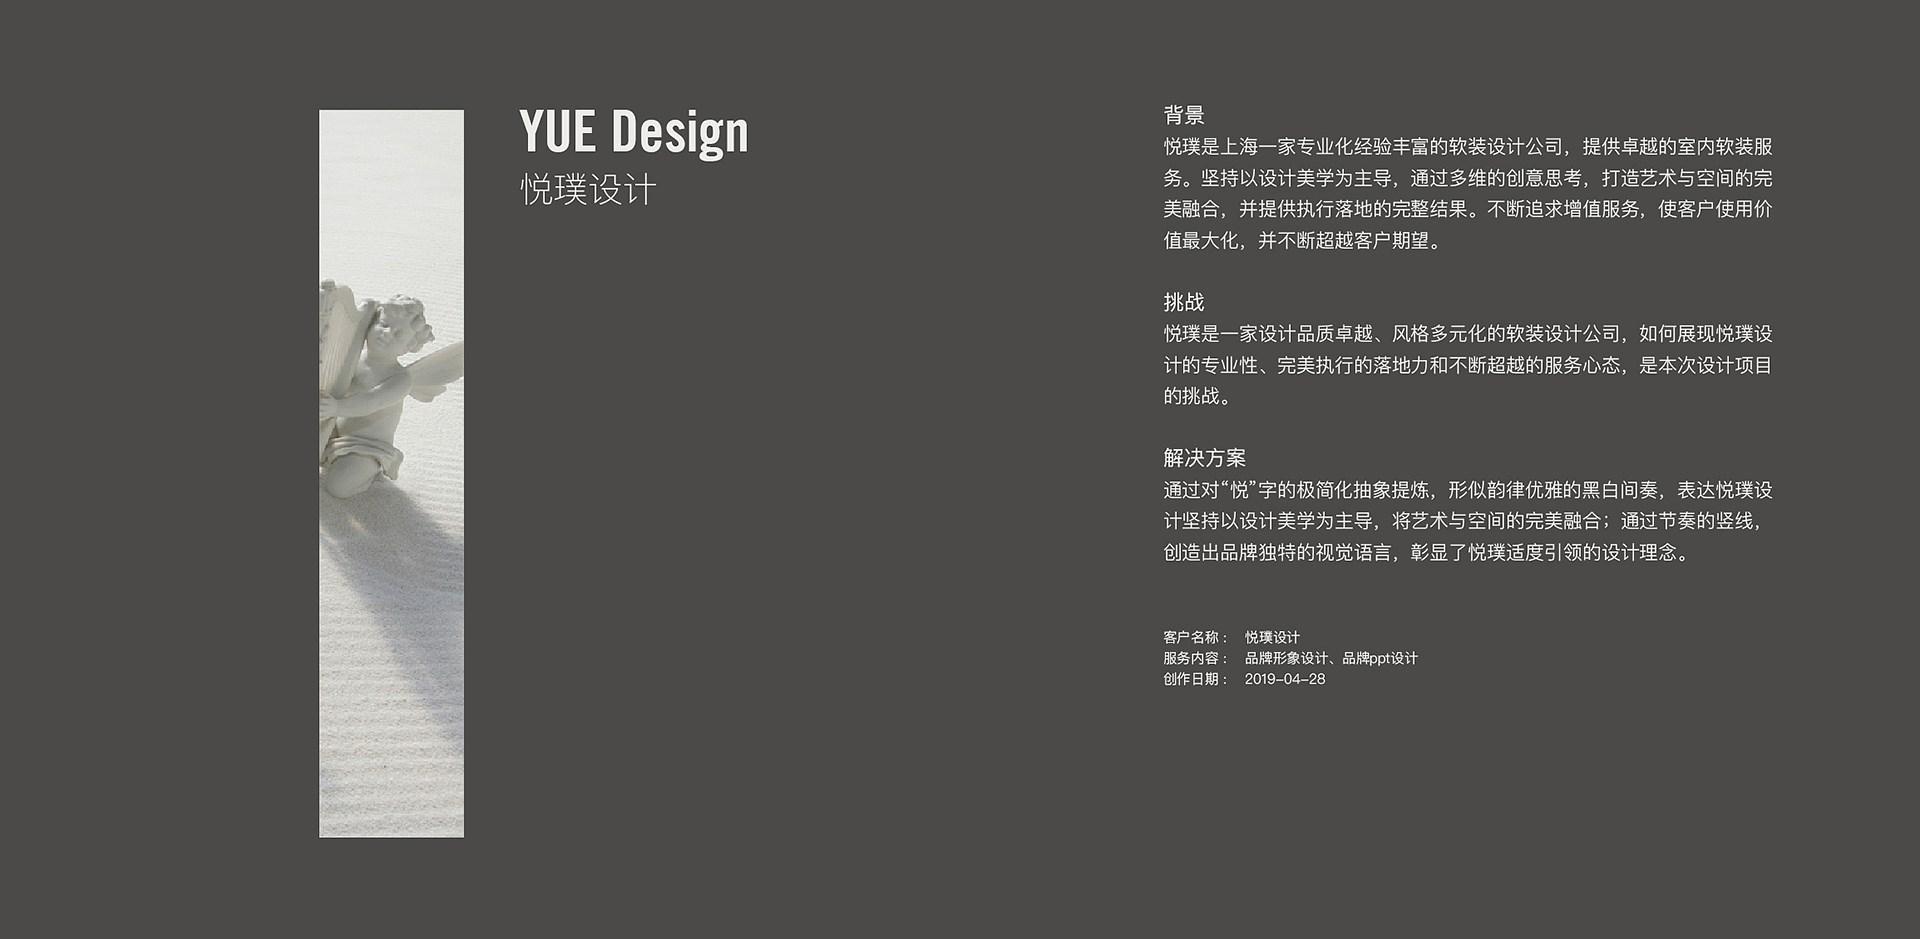 yue_web-01.jpg